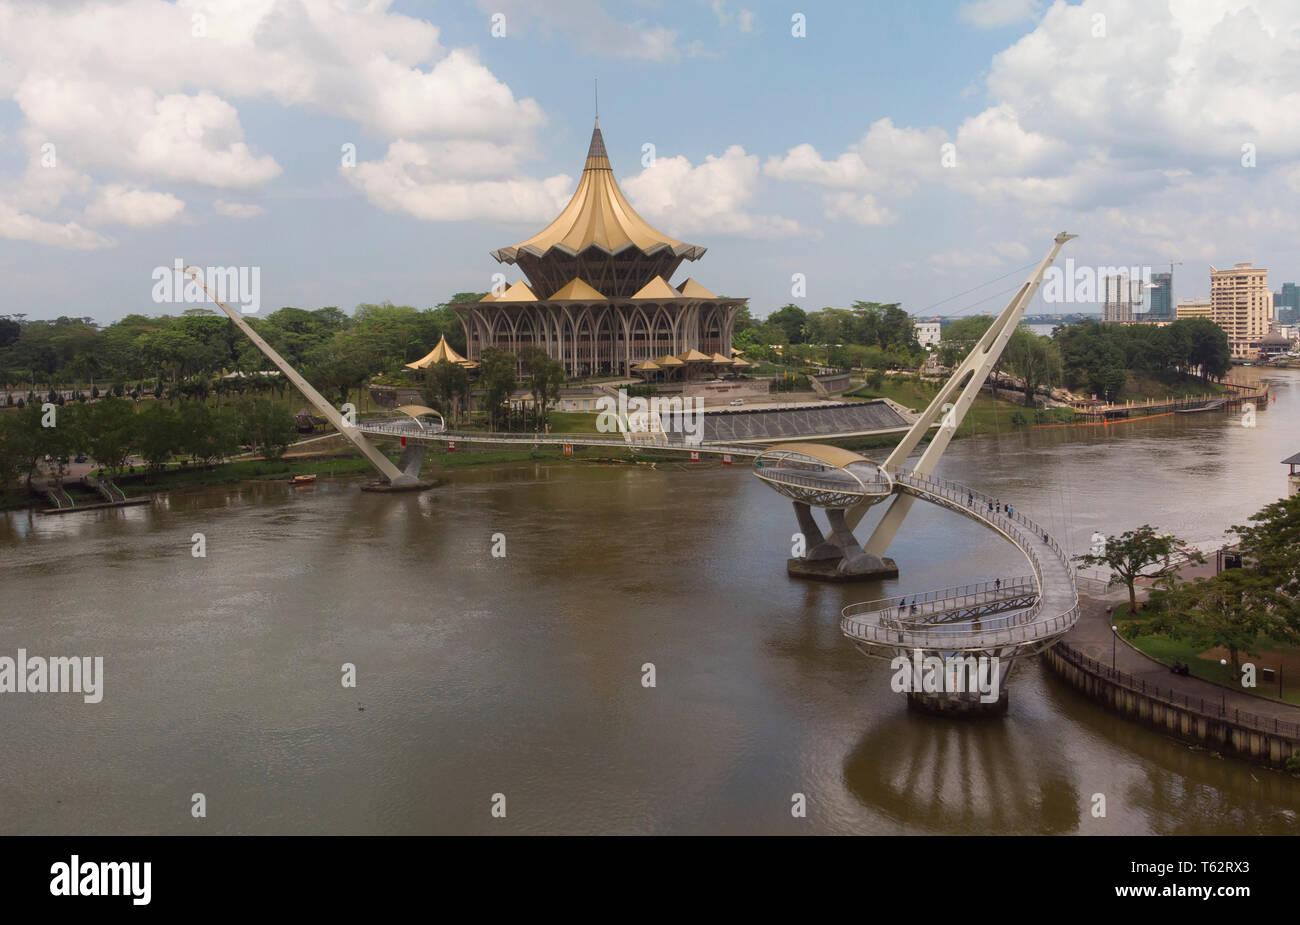 Drone photograph of Darul Hana bridge and Dewan Undangan Negri State Assembly building, Sarawak River, Kuching, Malaysia - Stock Image